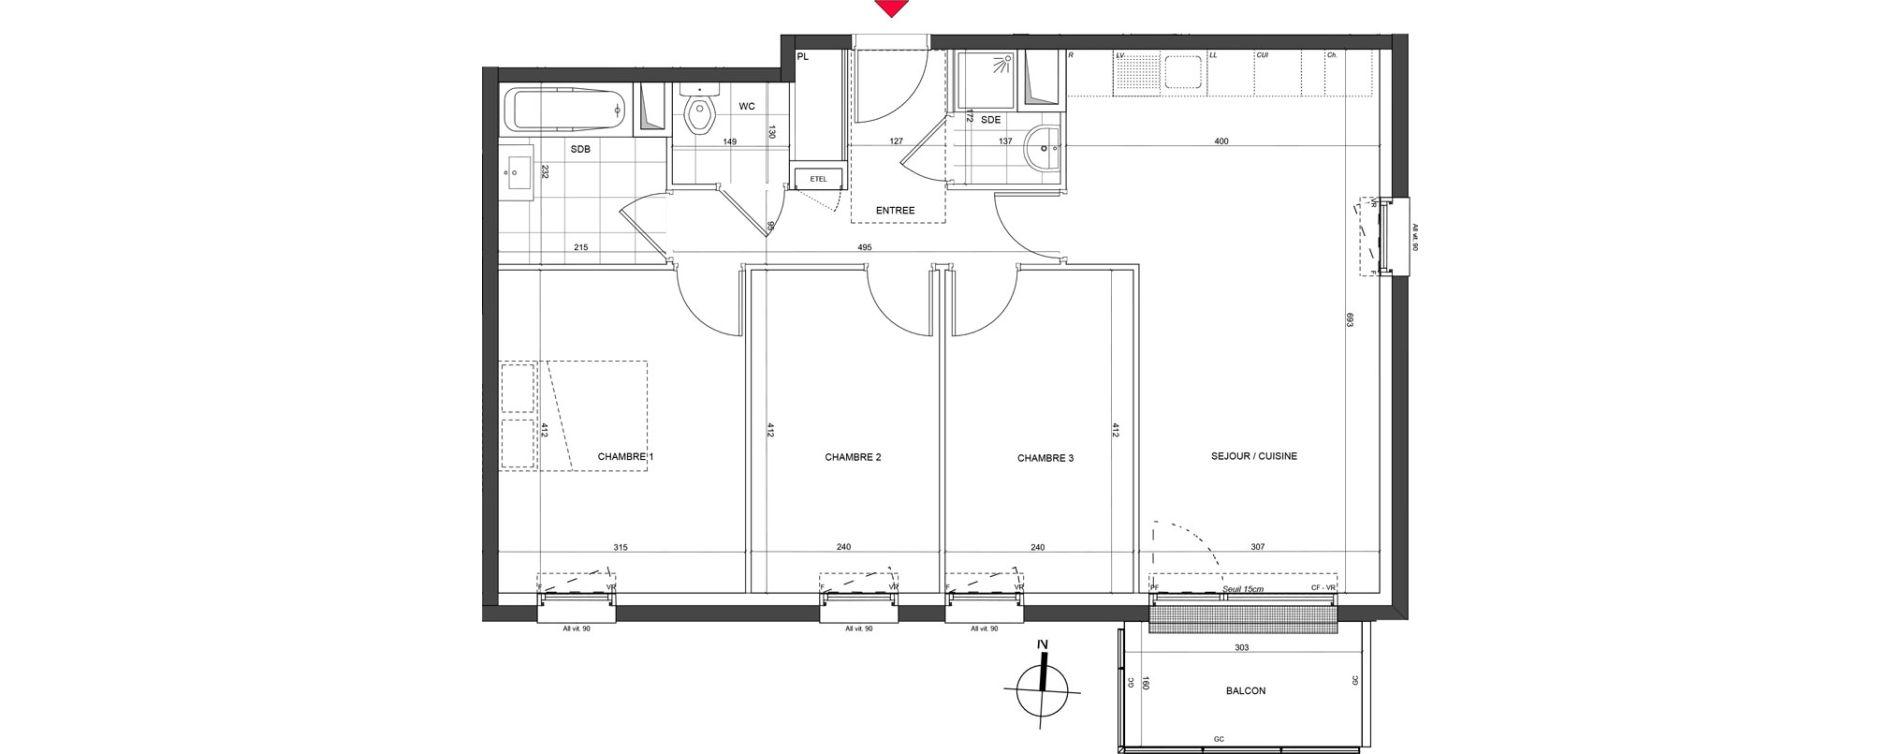 Appartement T4 de 73,03 m2 à Nancy Charles iii